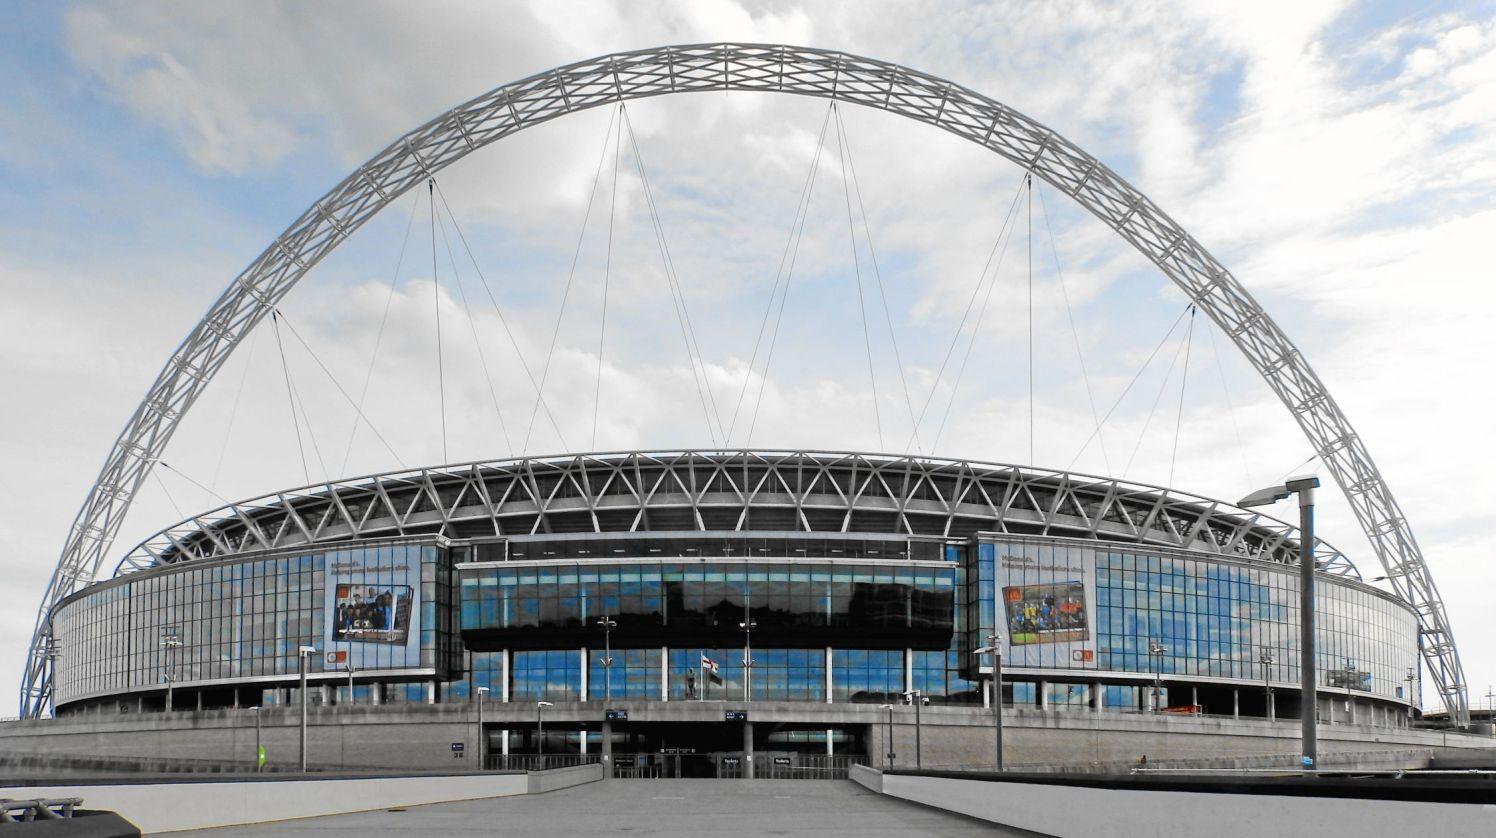 Wembley-Stadion_2013_16x10